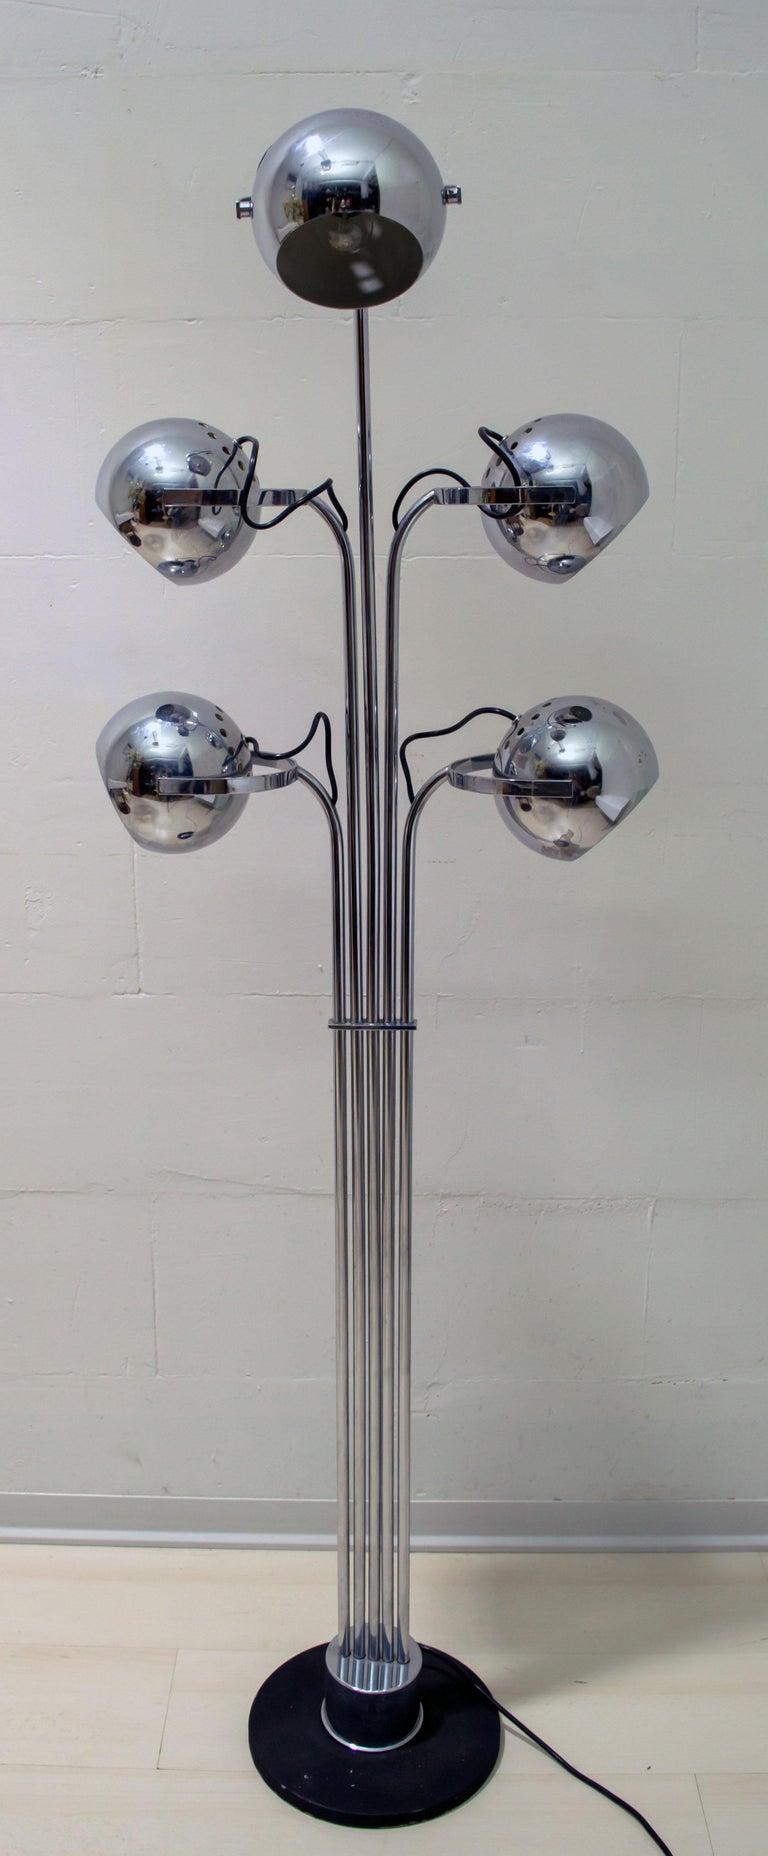 Goffredo Reggiani Mid-Century Modern Italian 5 Lights Chrome Floor Lamp, 1970s For Sale 2